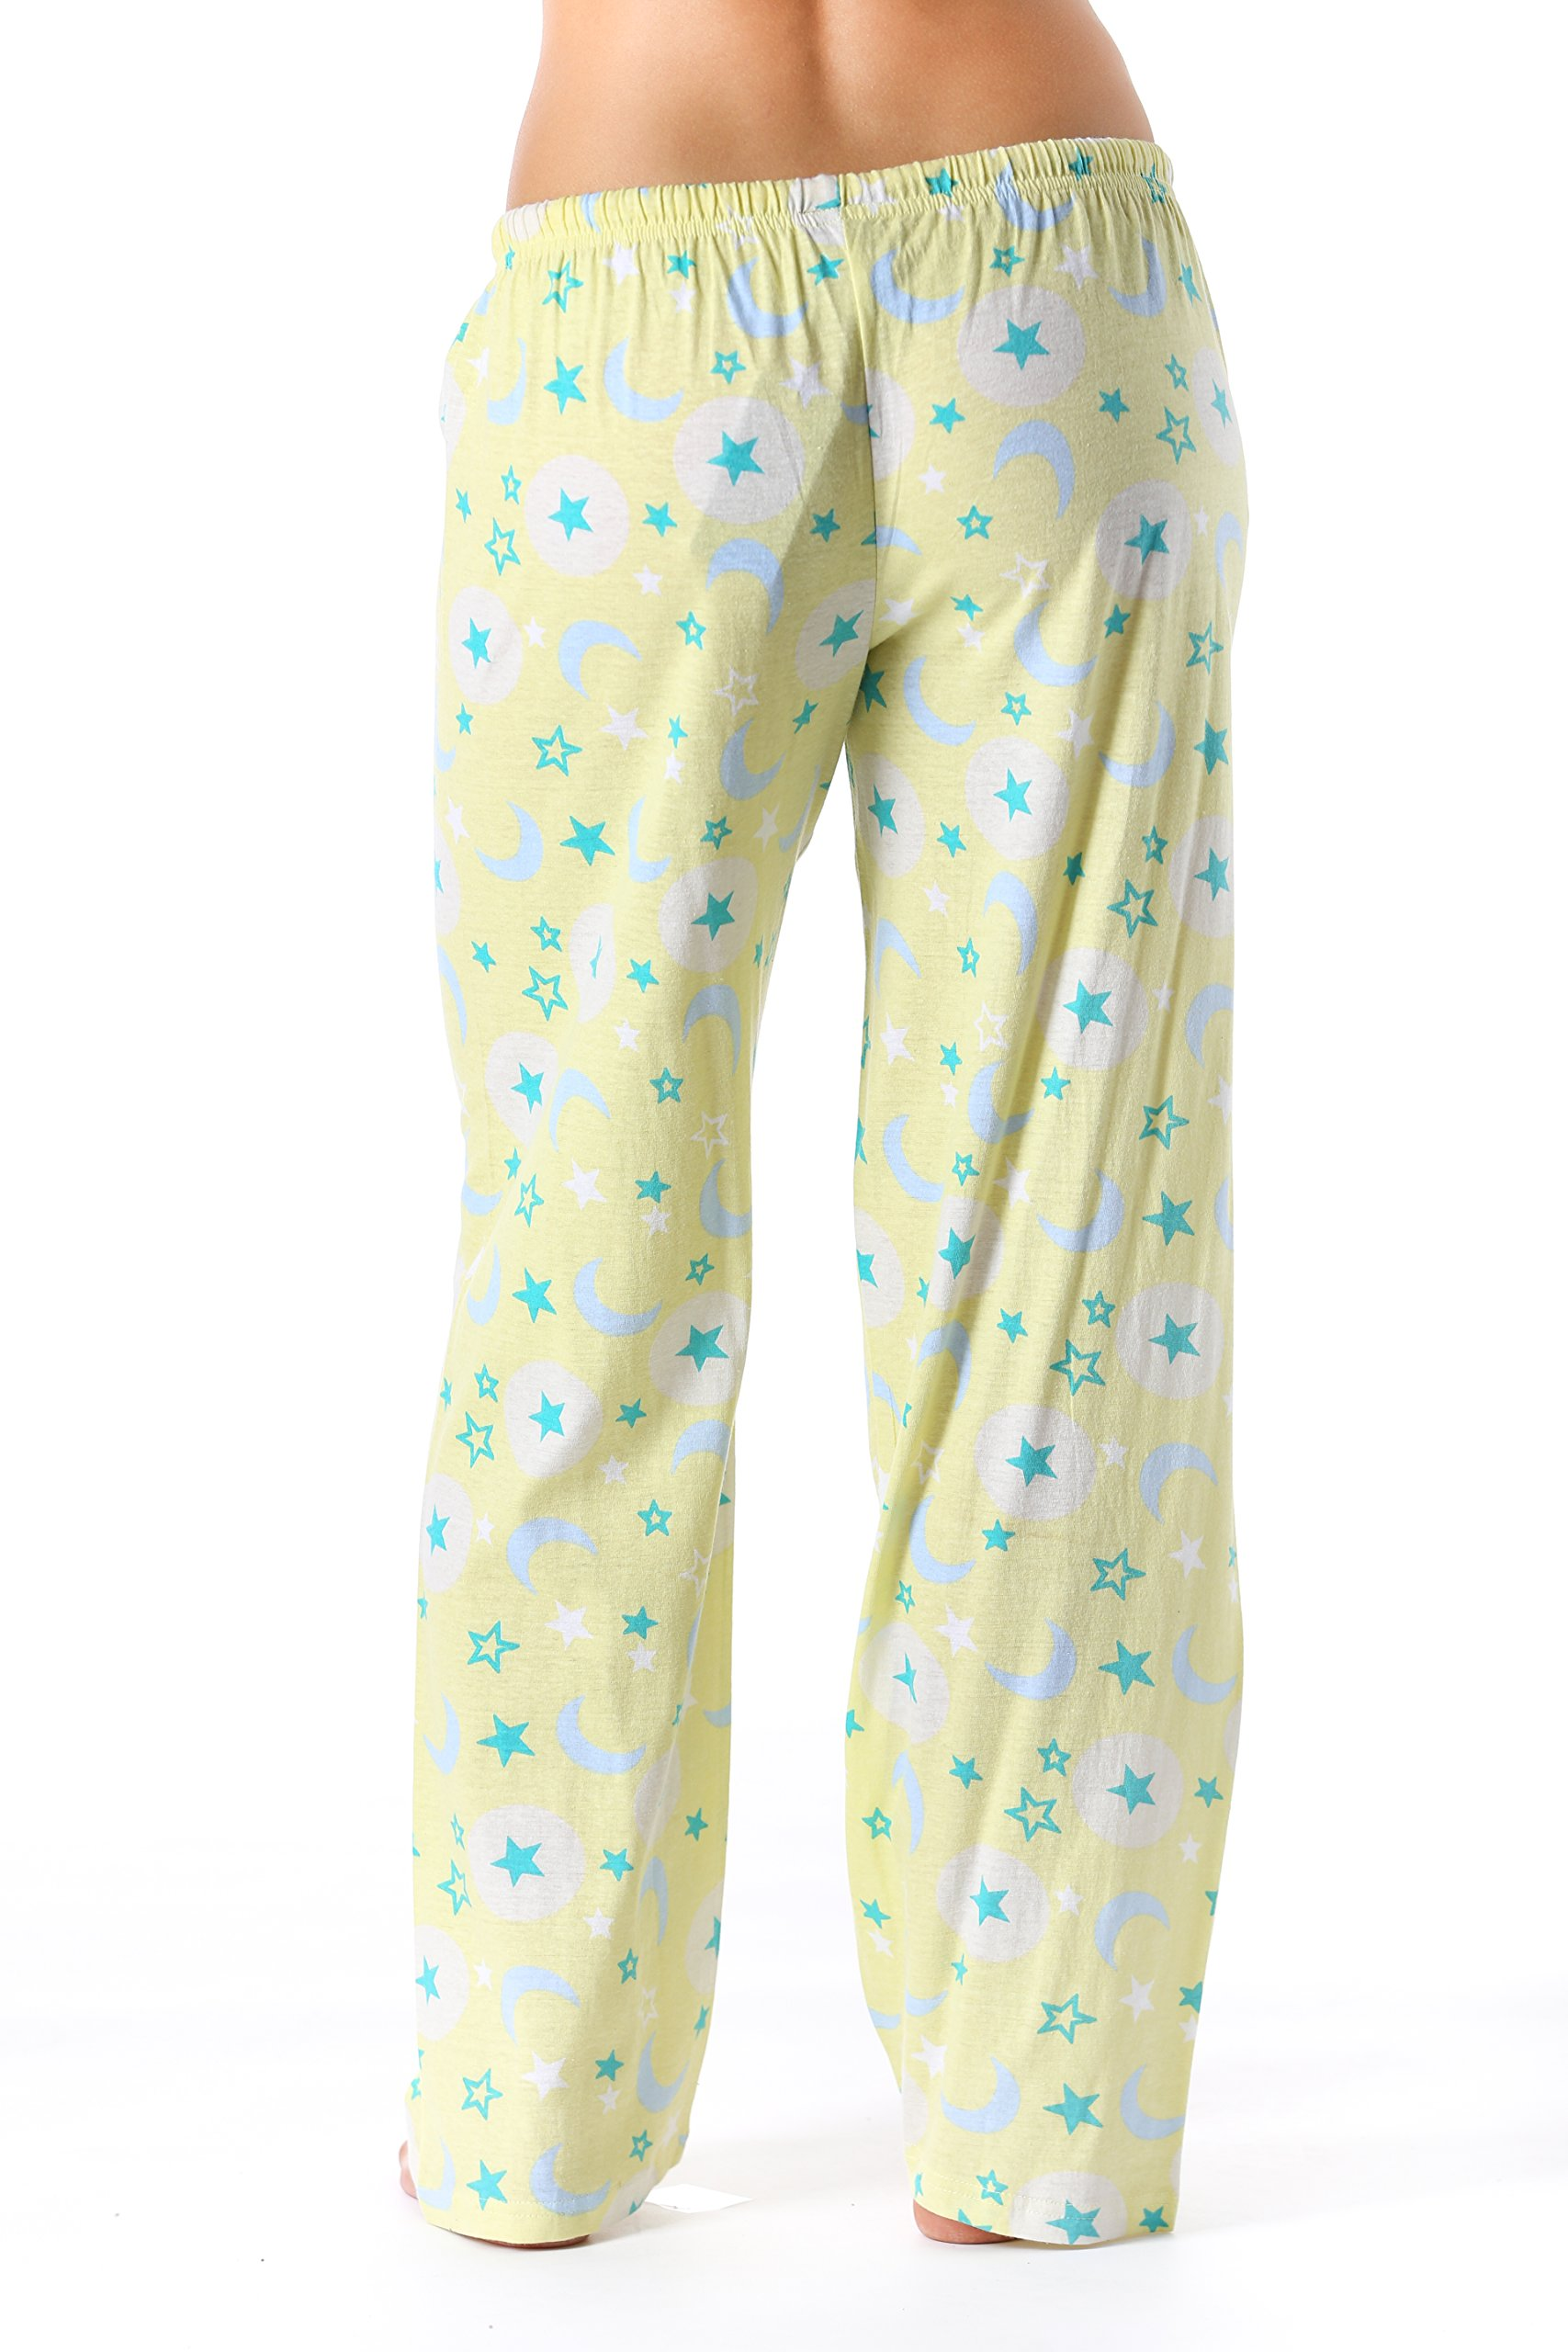 Just Love 6324-10061-S Women Pajama Pants/Sleepwear, Celestial Glow, Small by Just Love (Image #3)